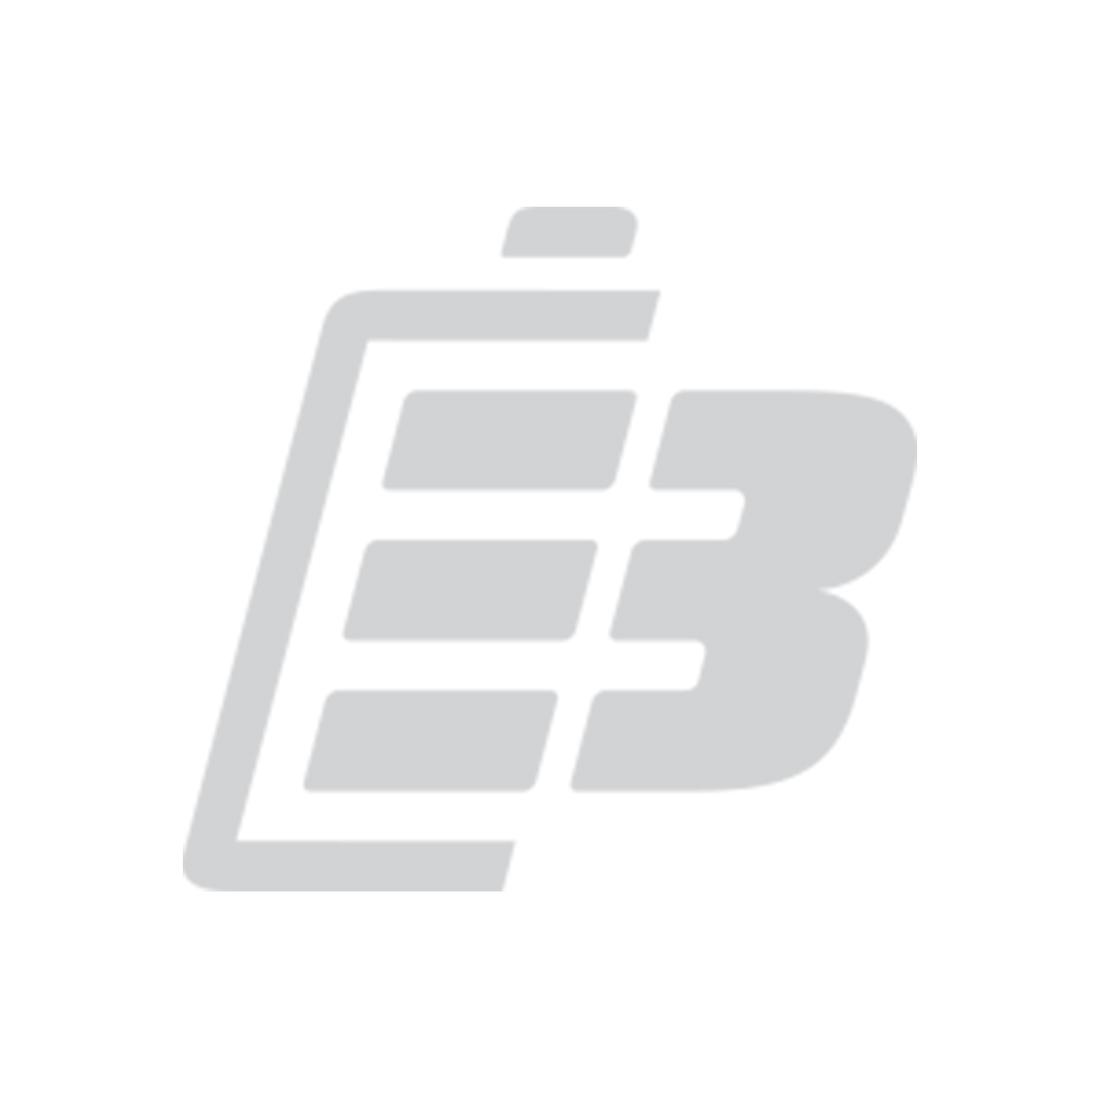 Laptop battery Asus K52_1